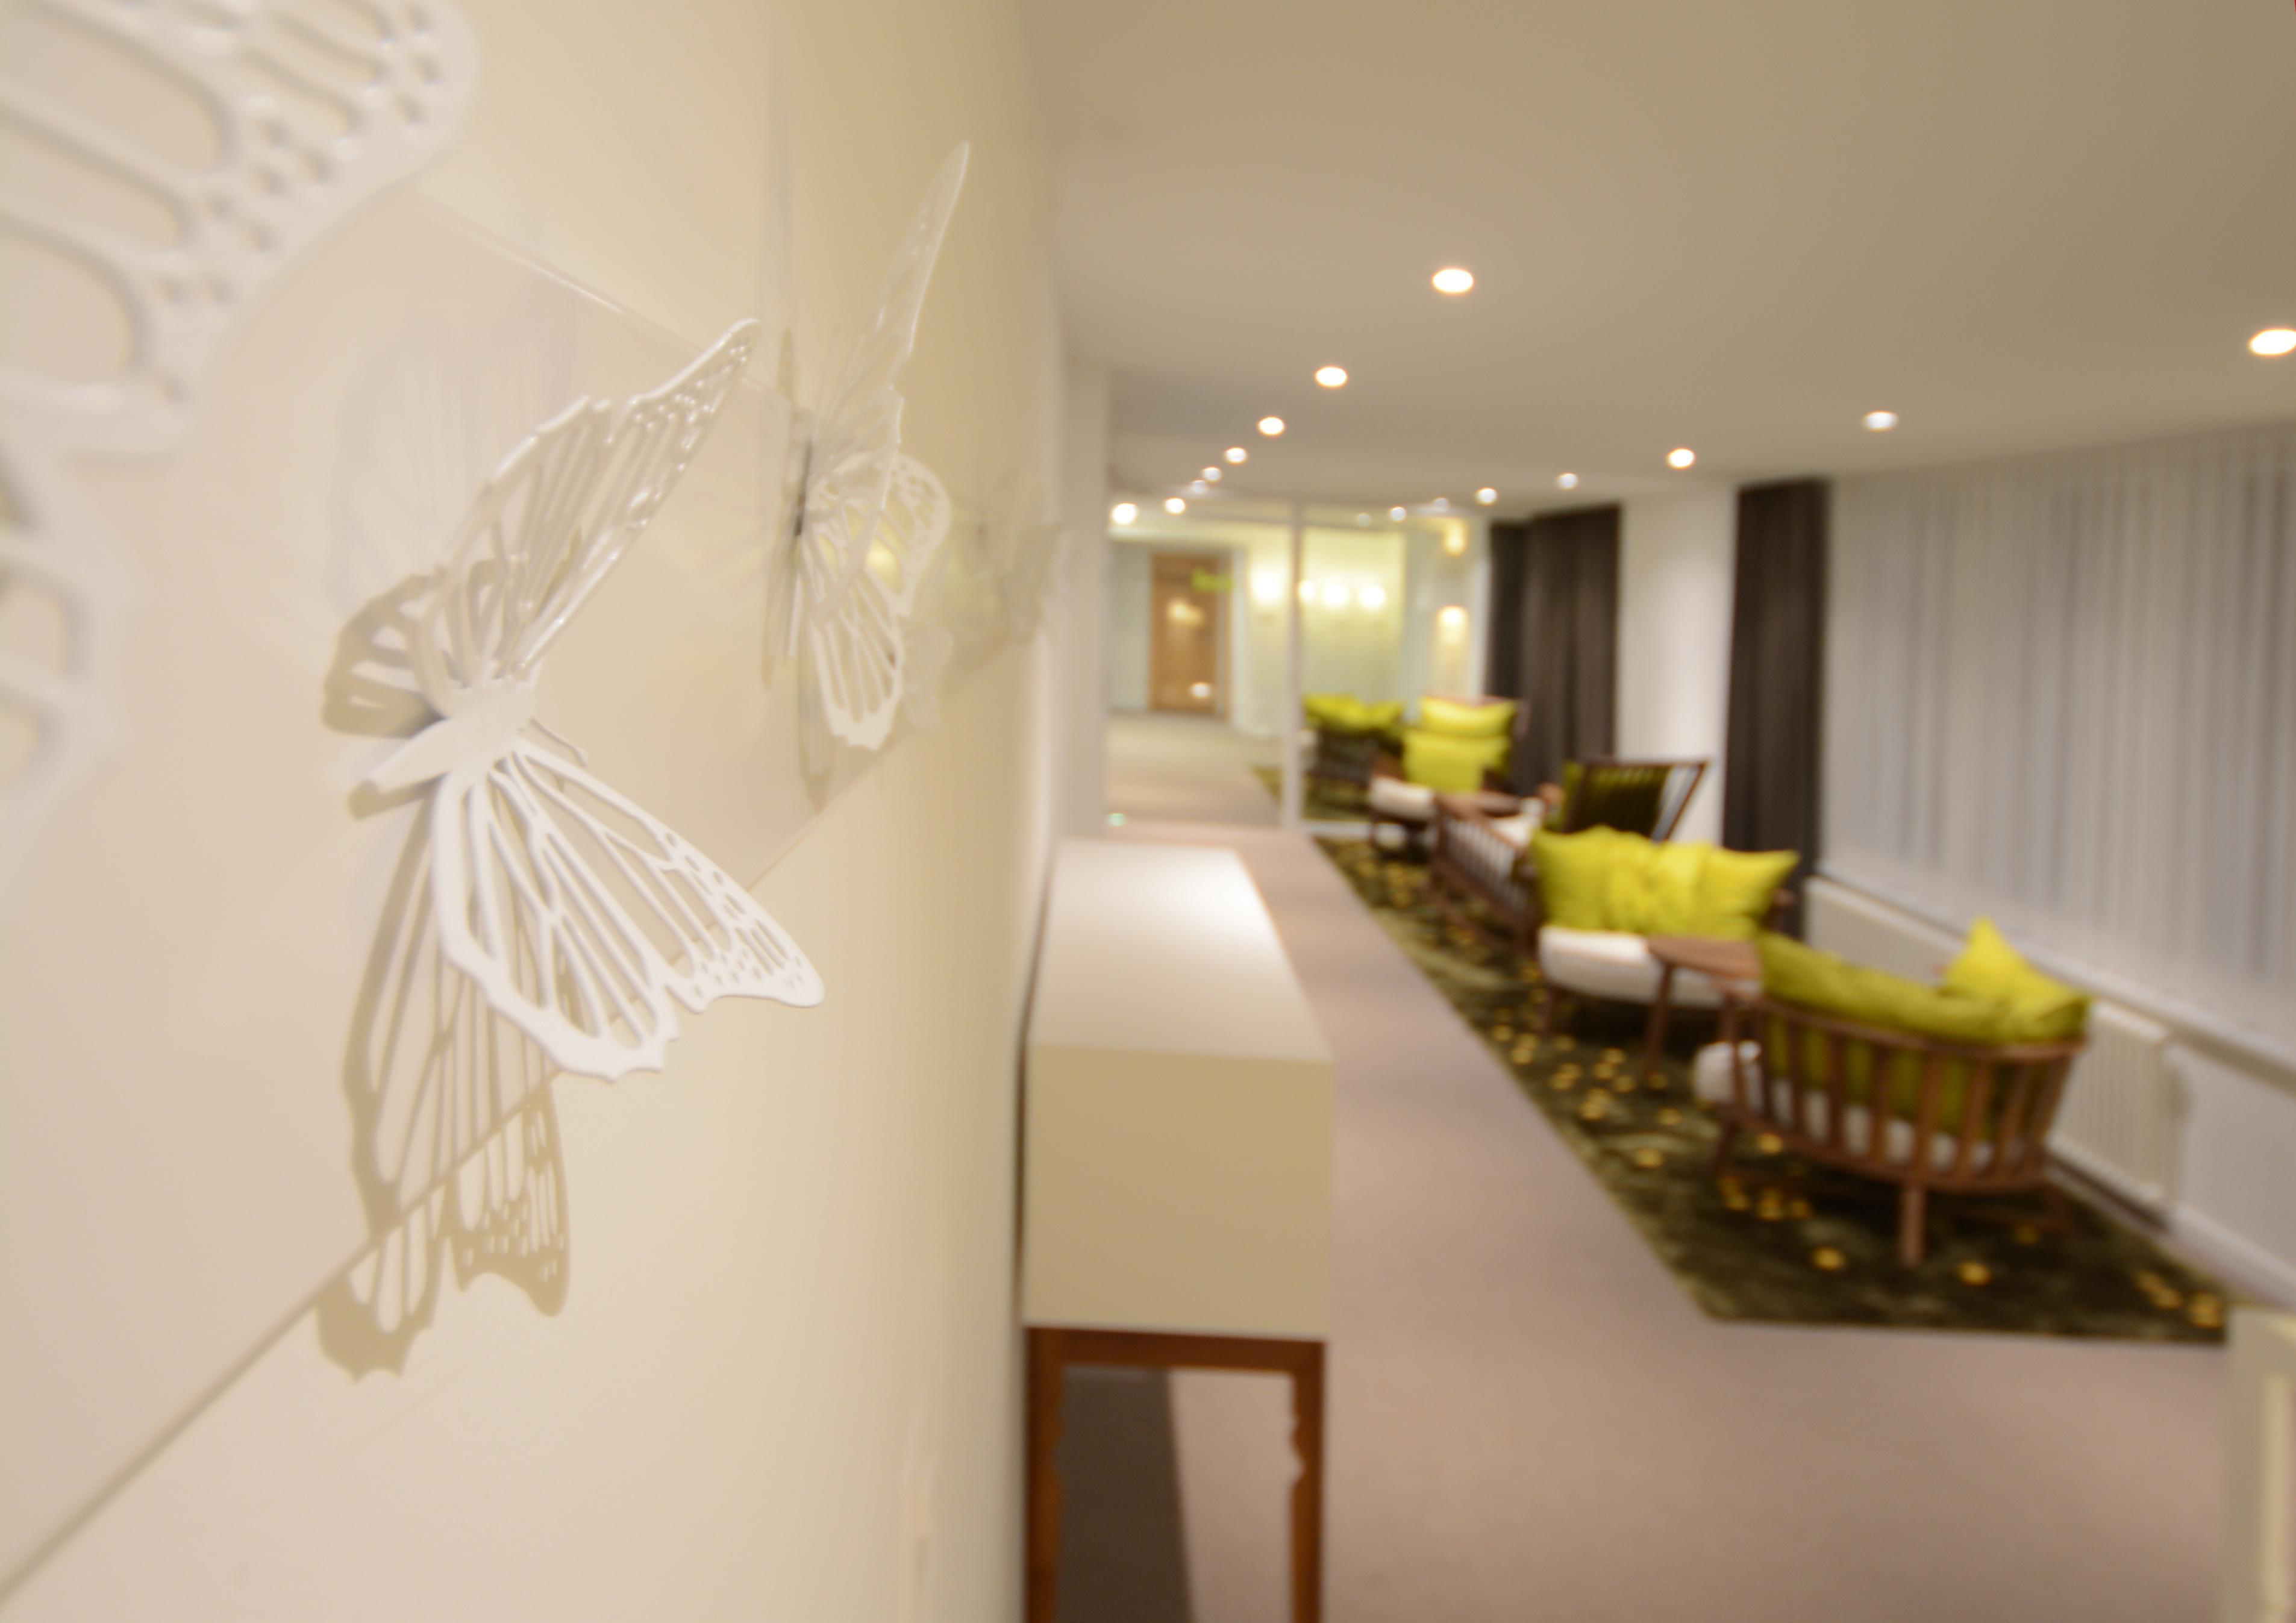 Landhotel linde fislisbach innenarchitektur leitgedanke for Design innenarchitektur